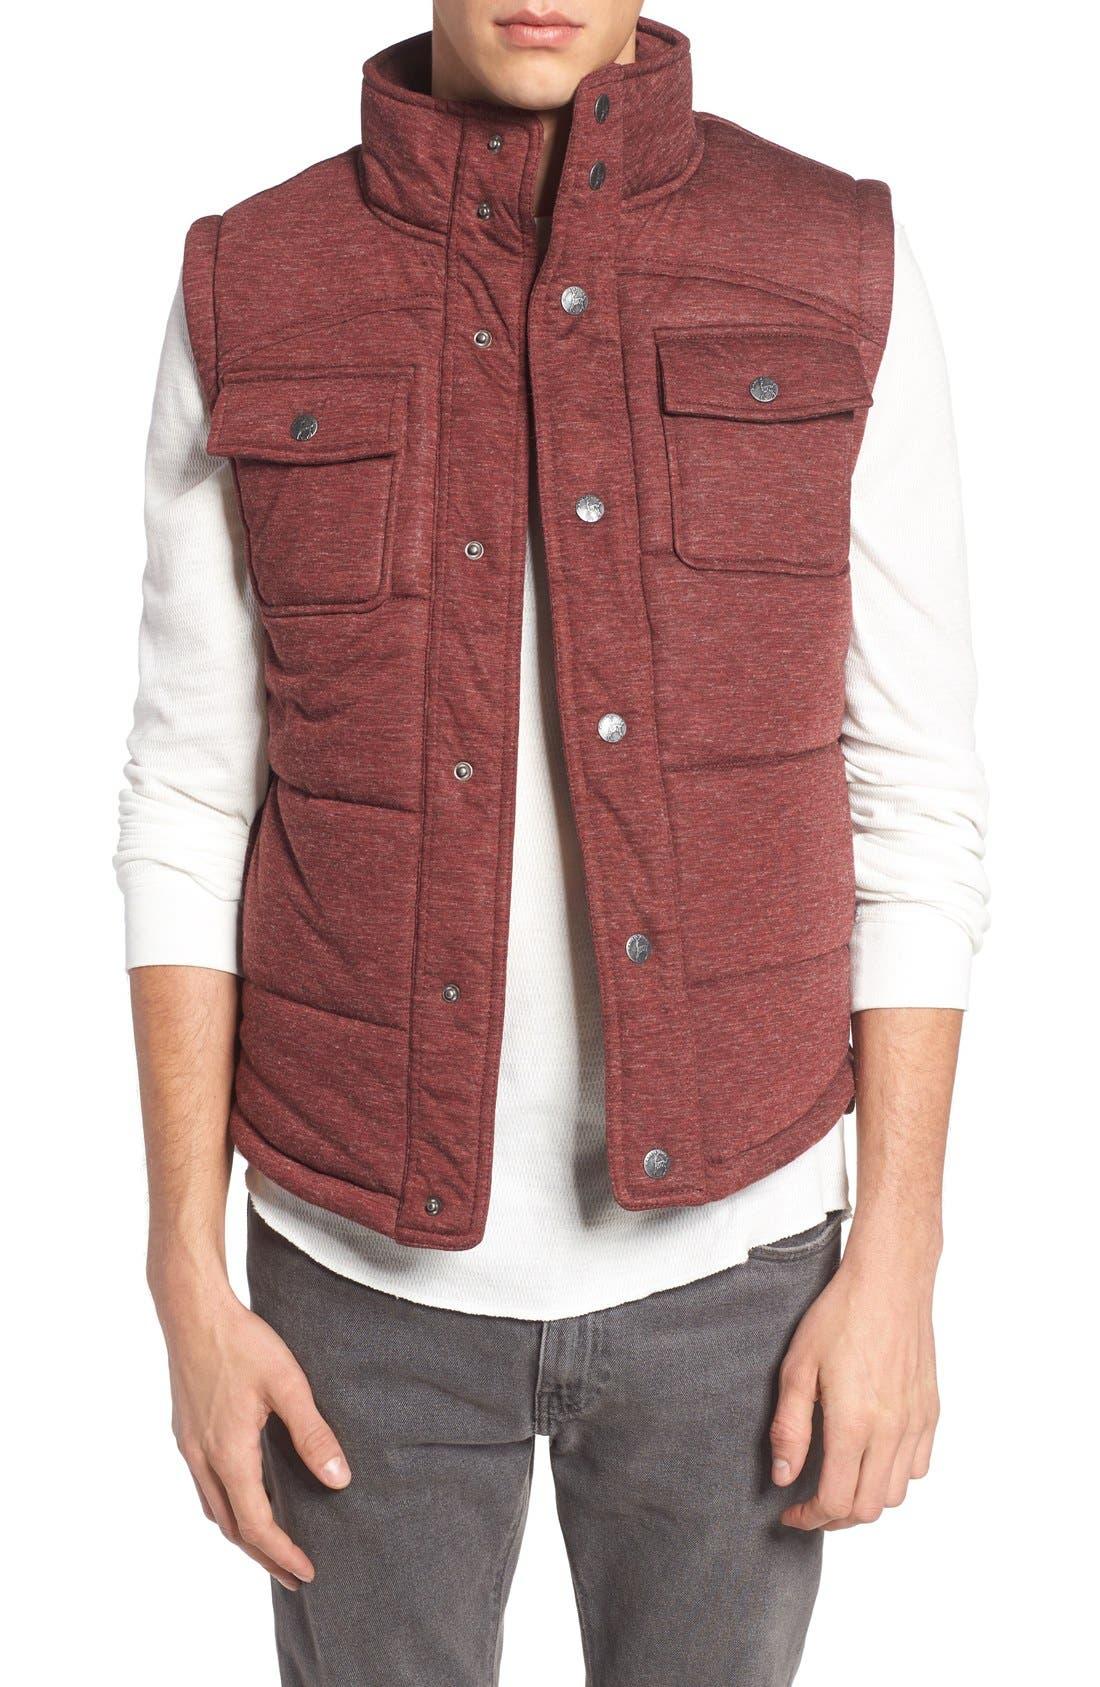 Alternate Image 1 Selected - Kane & Unke Heathered Jersey Vest